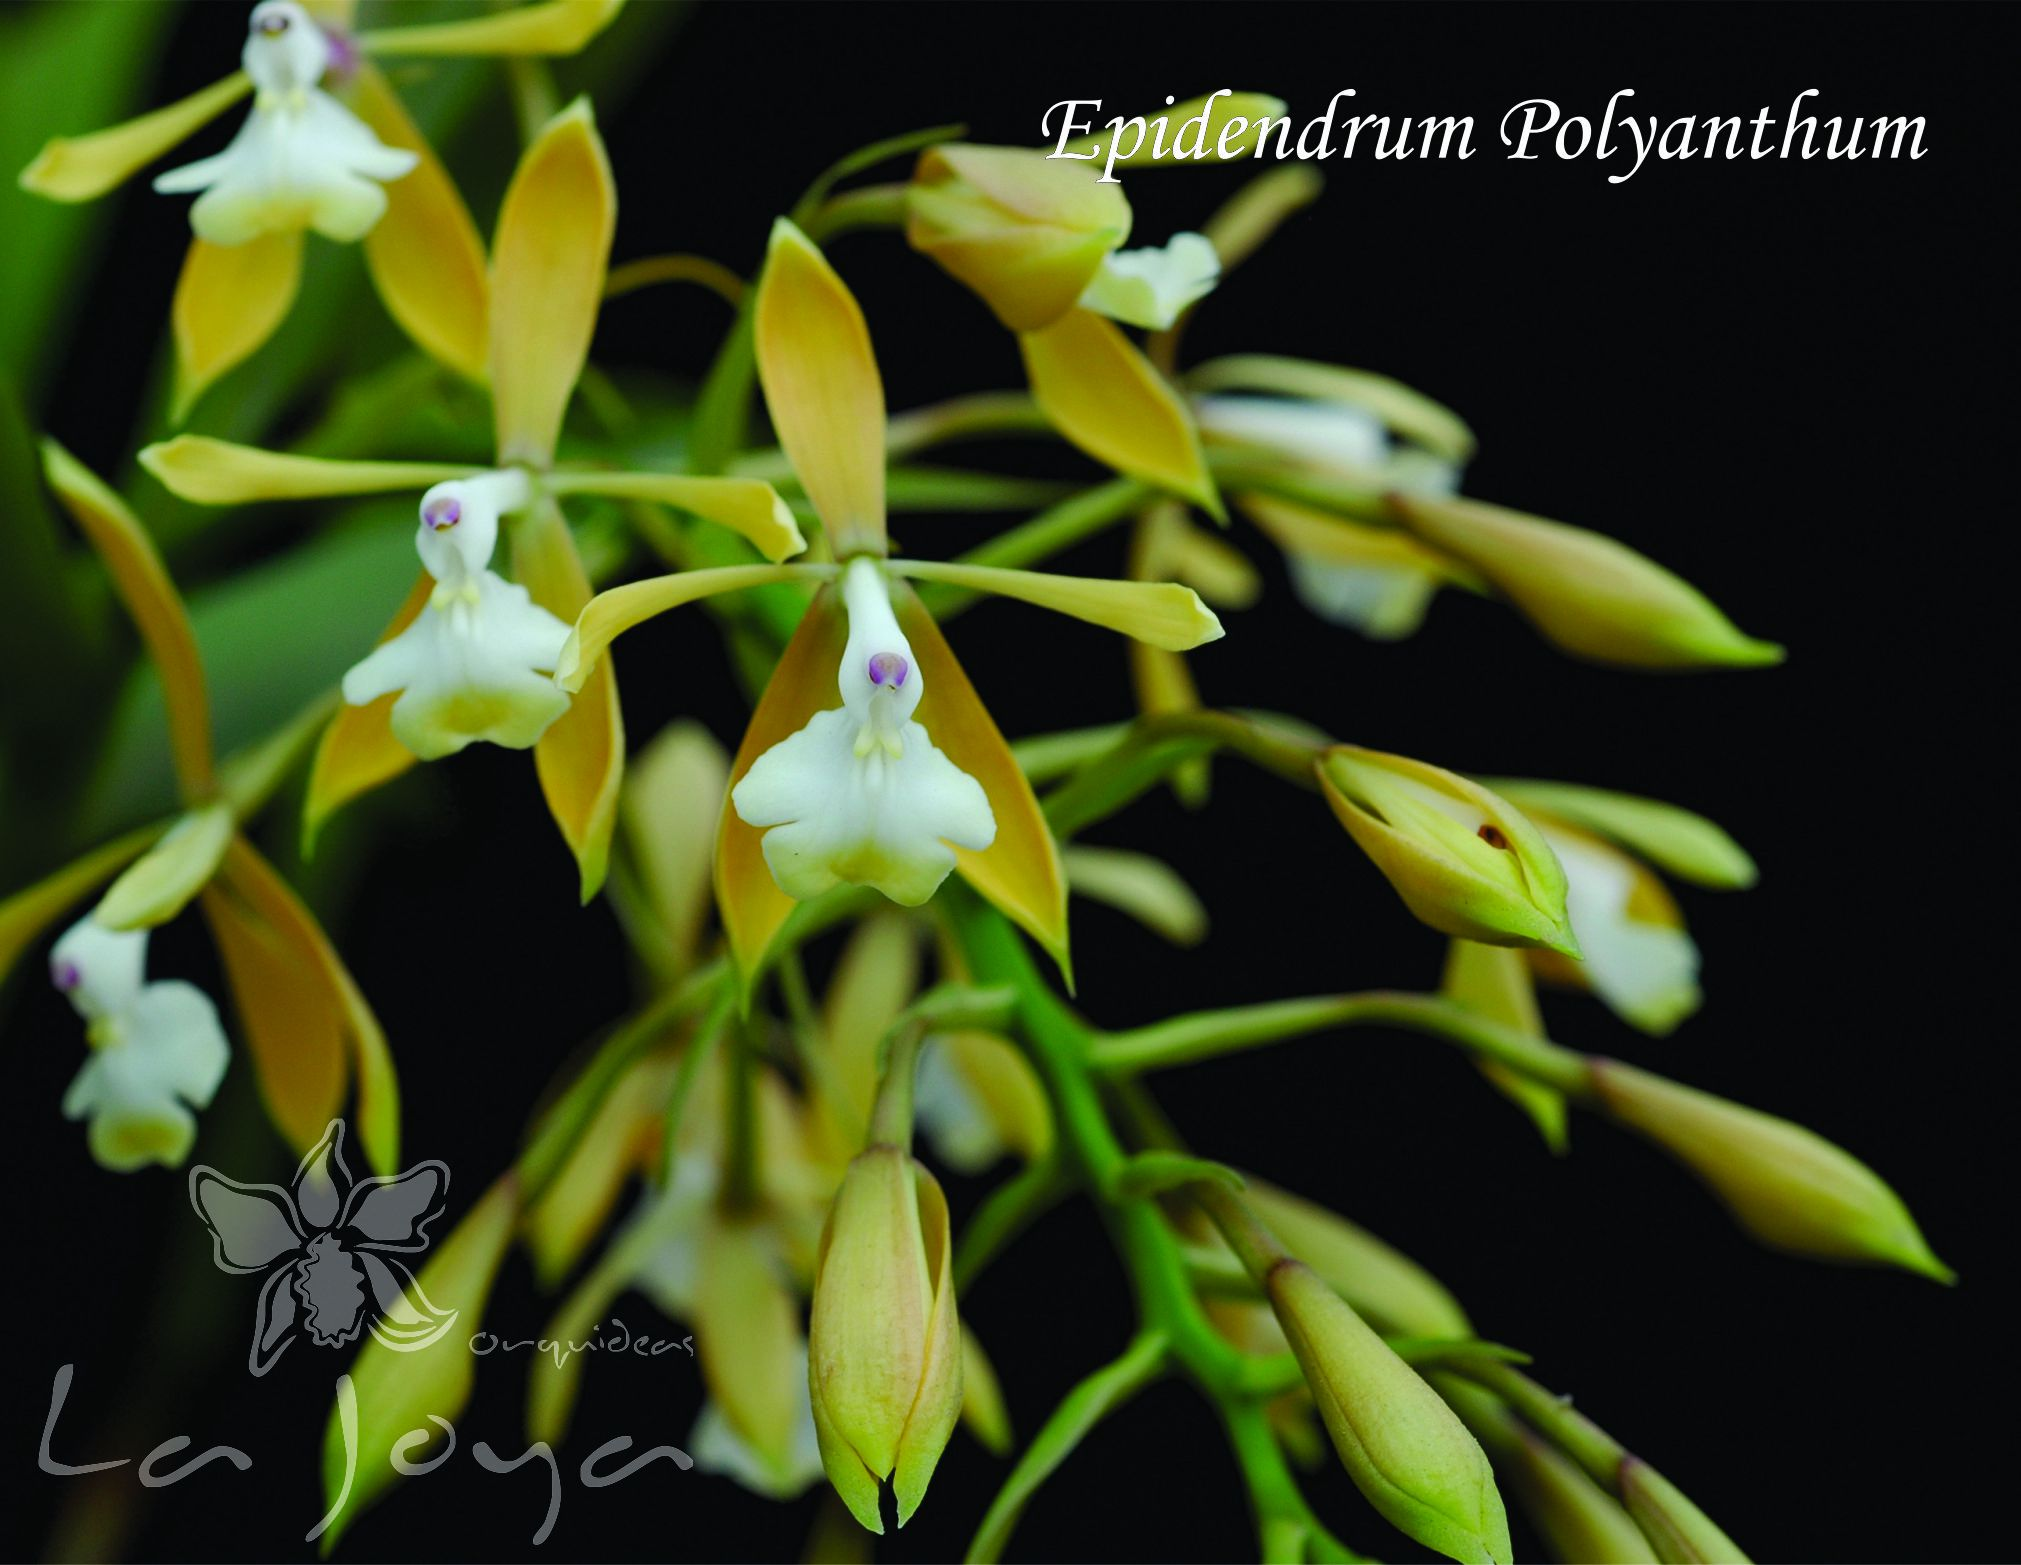 Epidendrum Polyanthum